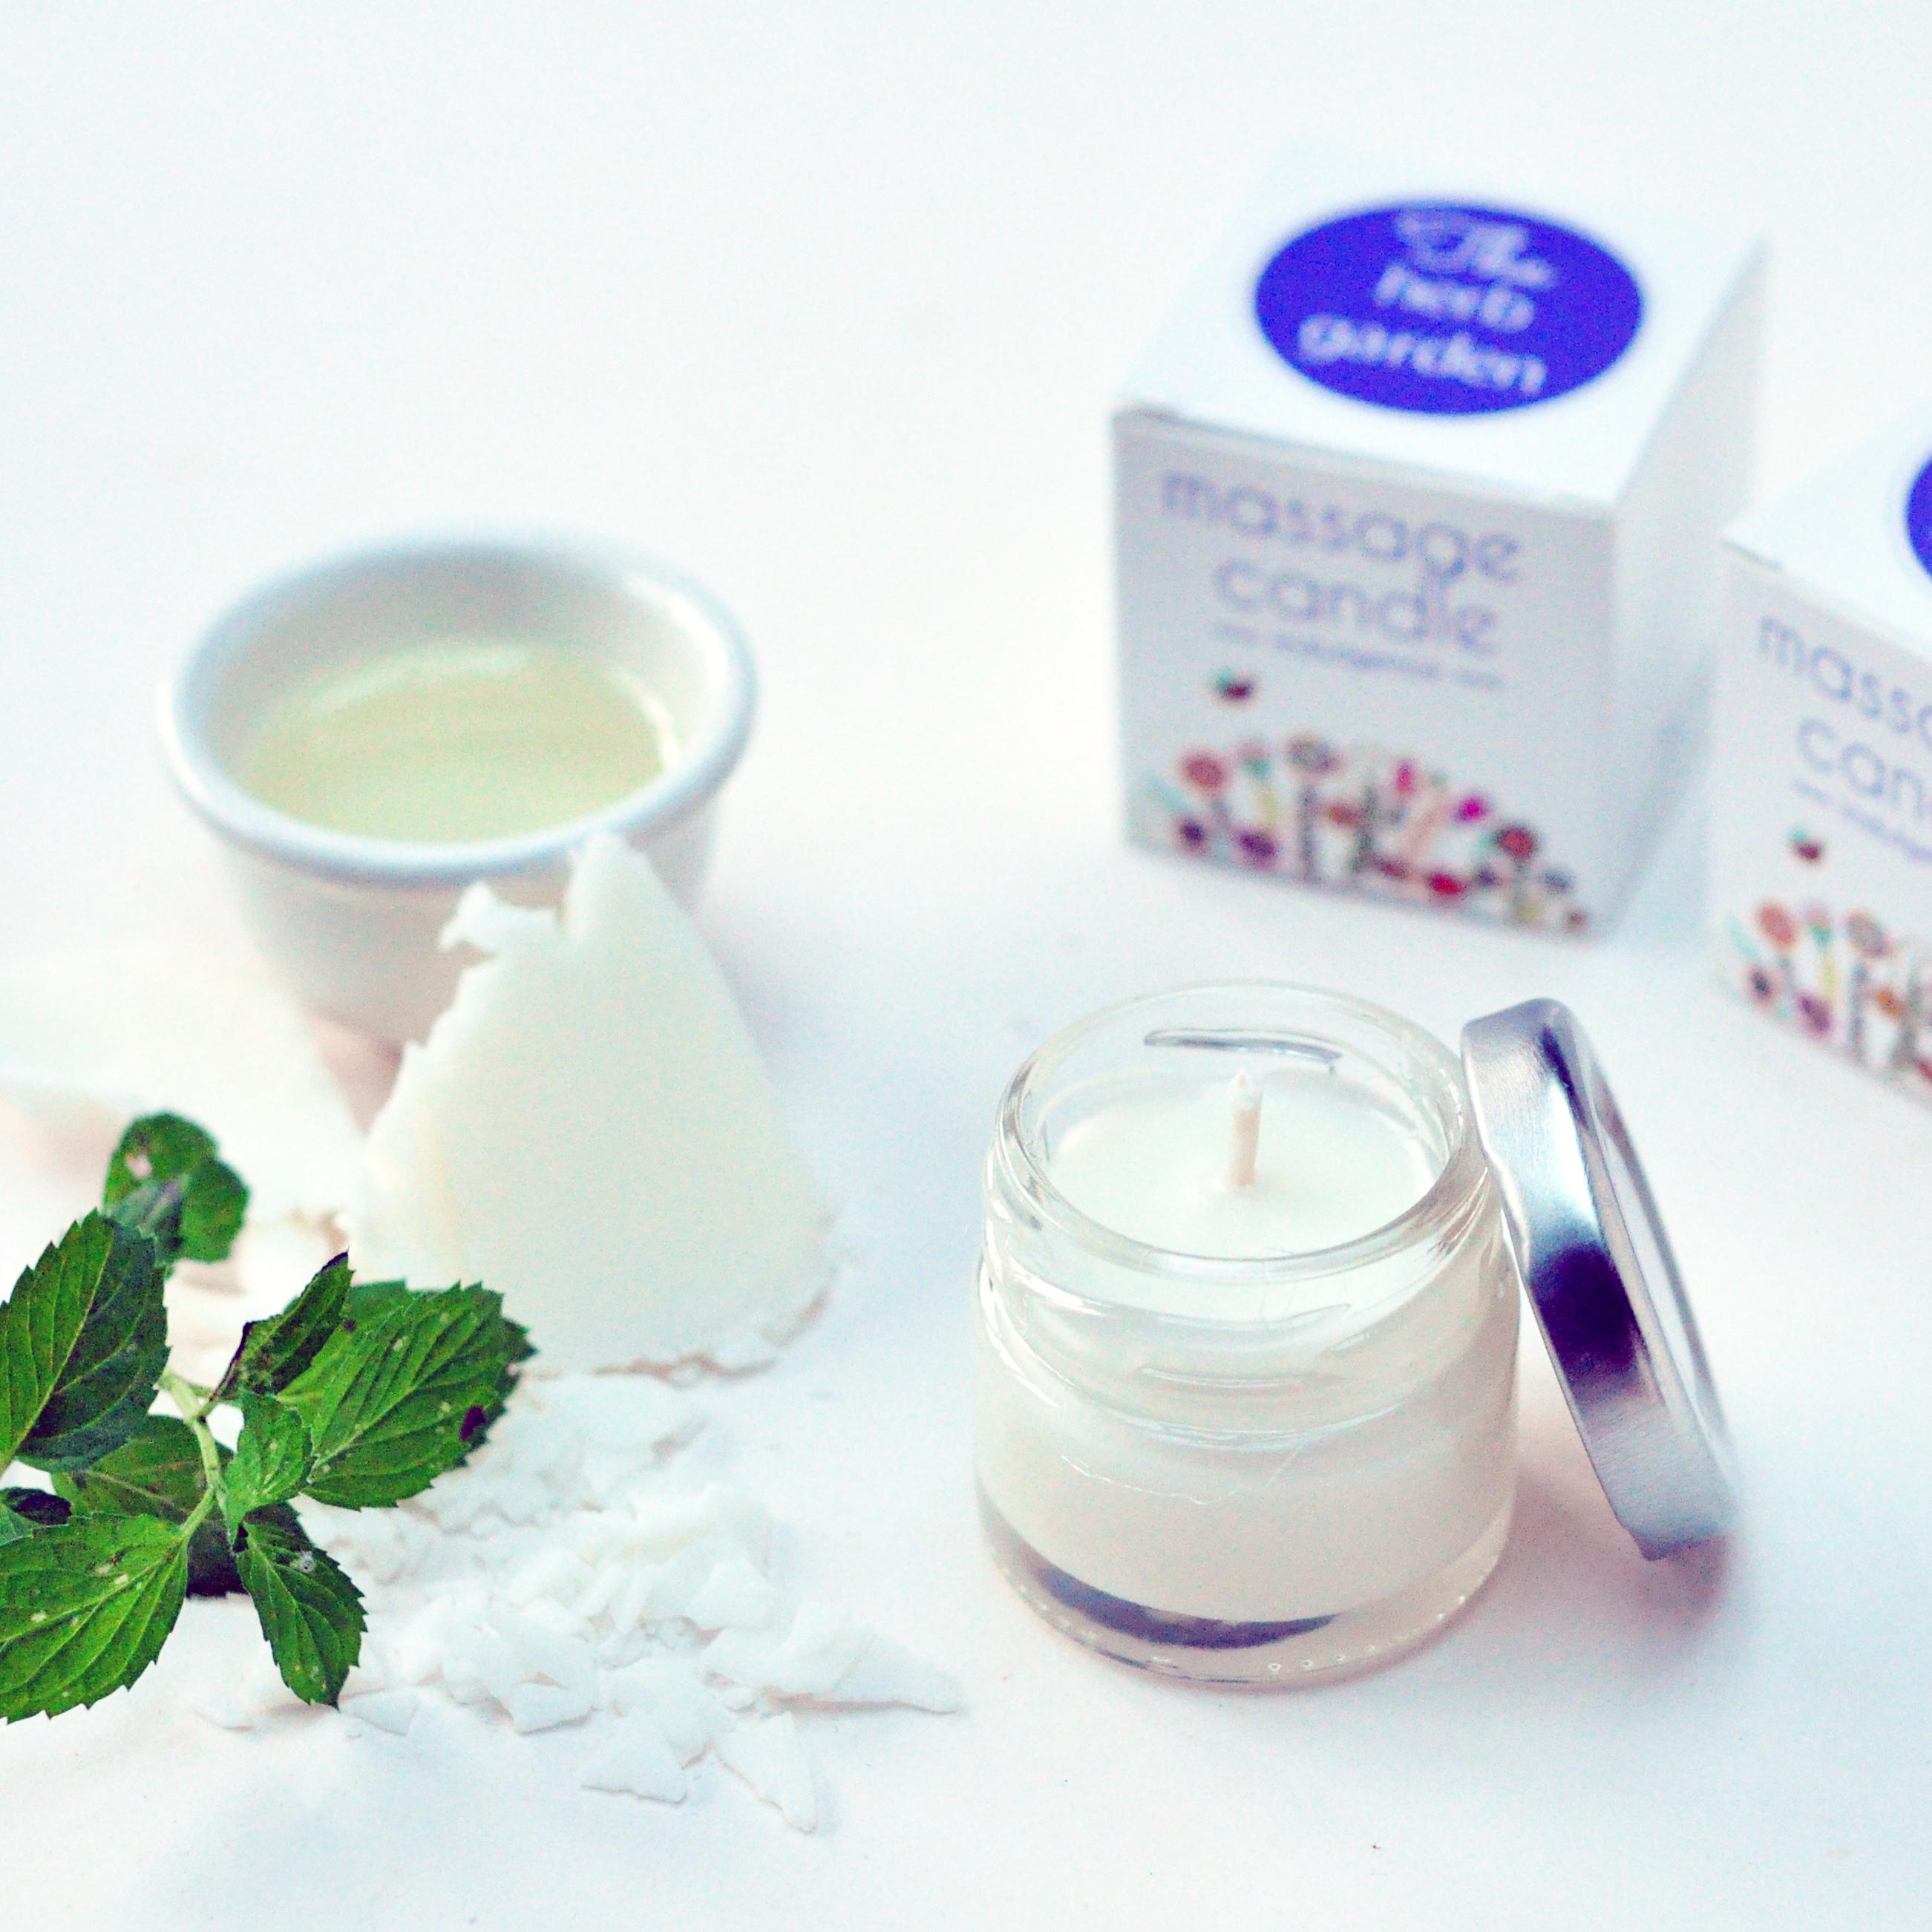 Refreshing Mini Massage Candle 00007